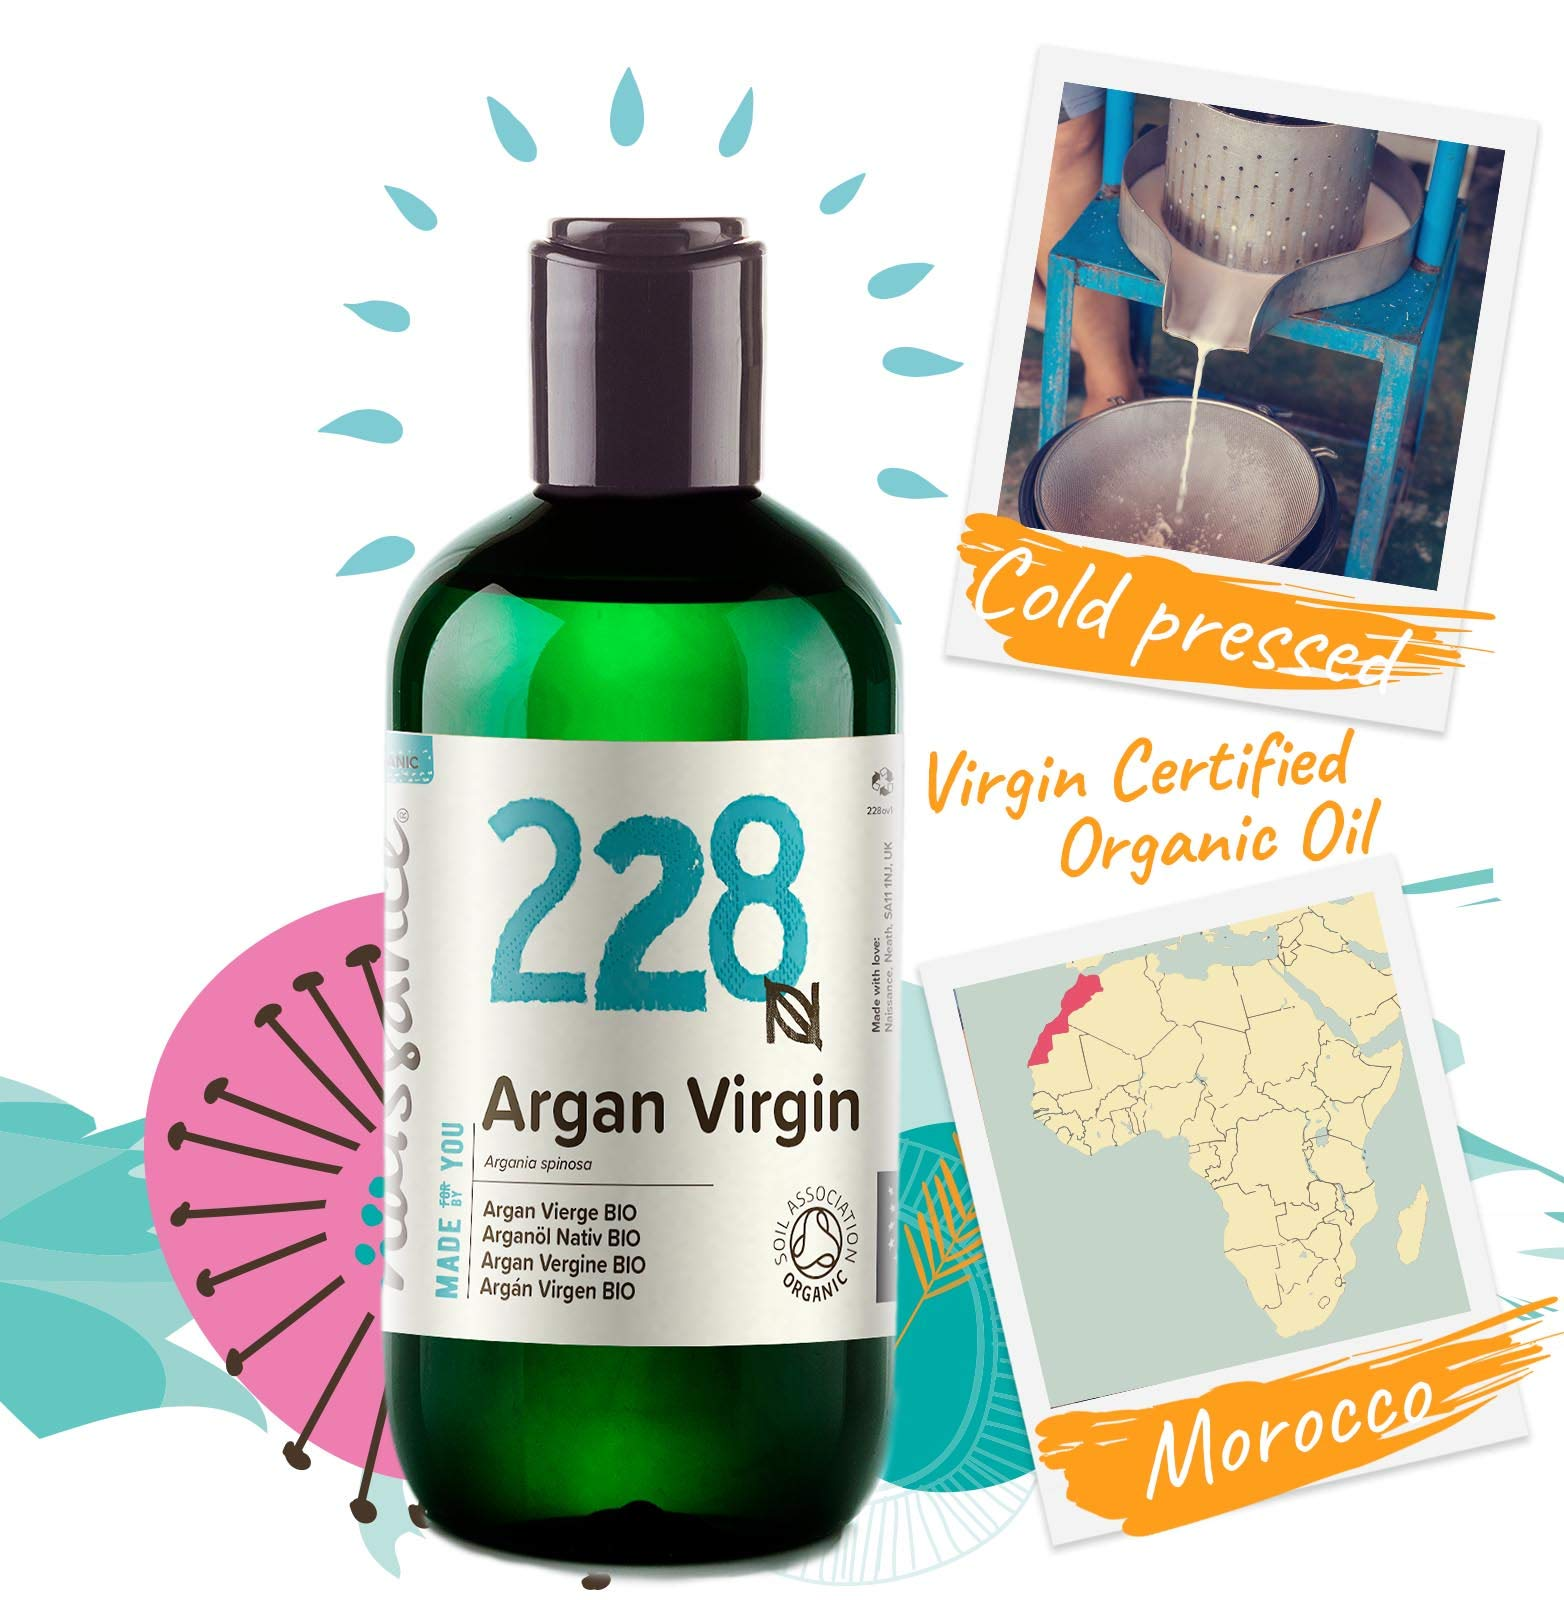 Naissance Aceite Vegetal de Argán de Marruecos BIO n. º 228-250ml – Puro, natural, vegano, certificado ecológico, sin…